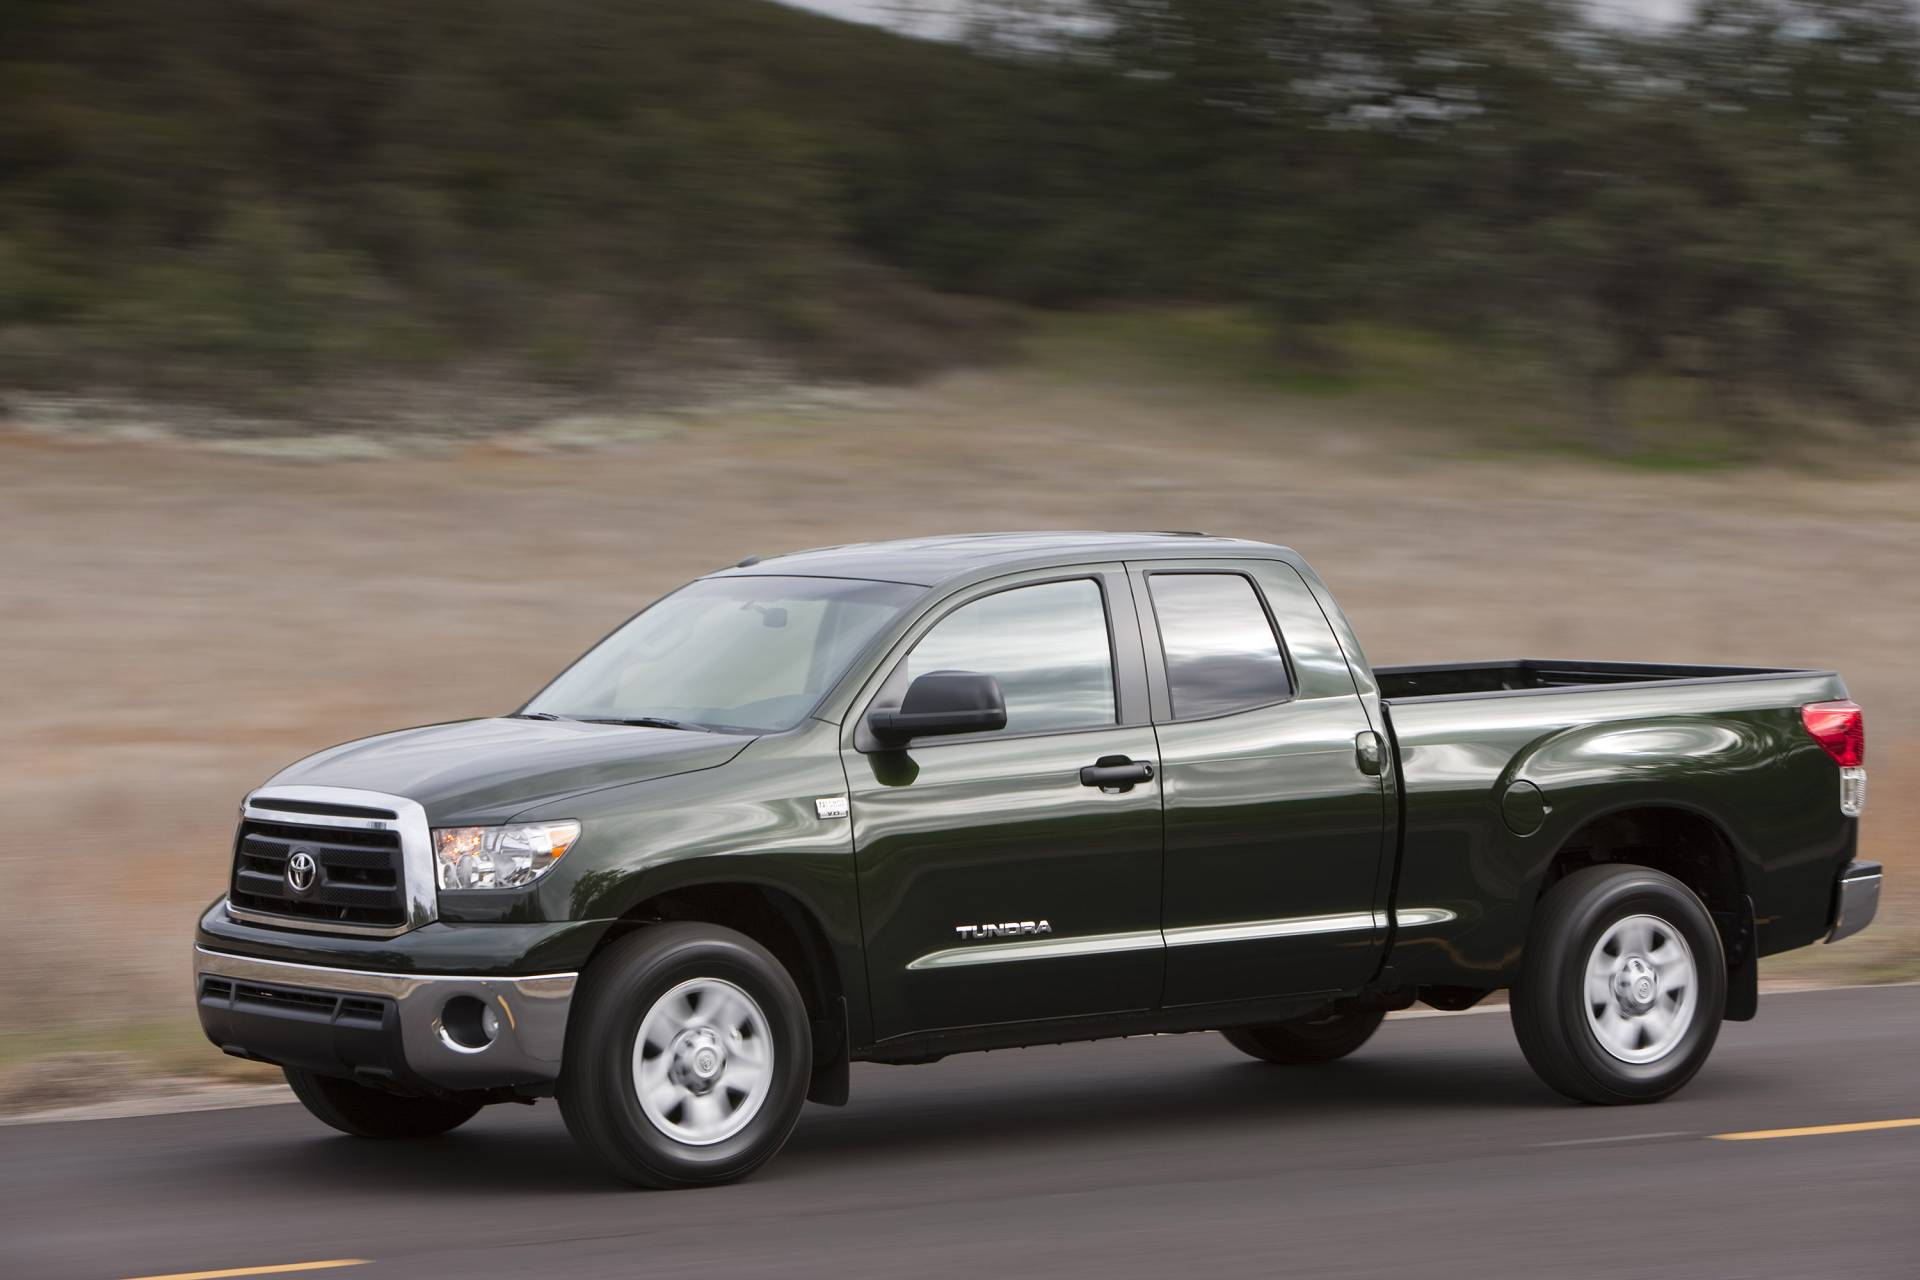 2013 Toyota Tundra News and Information